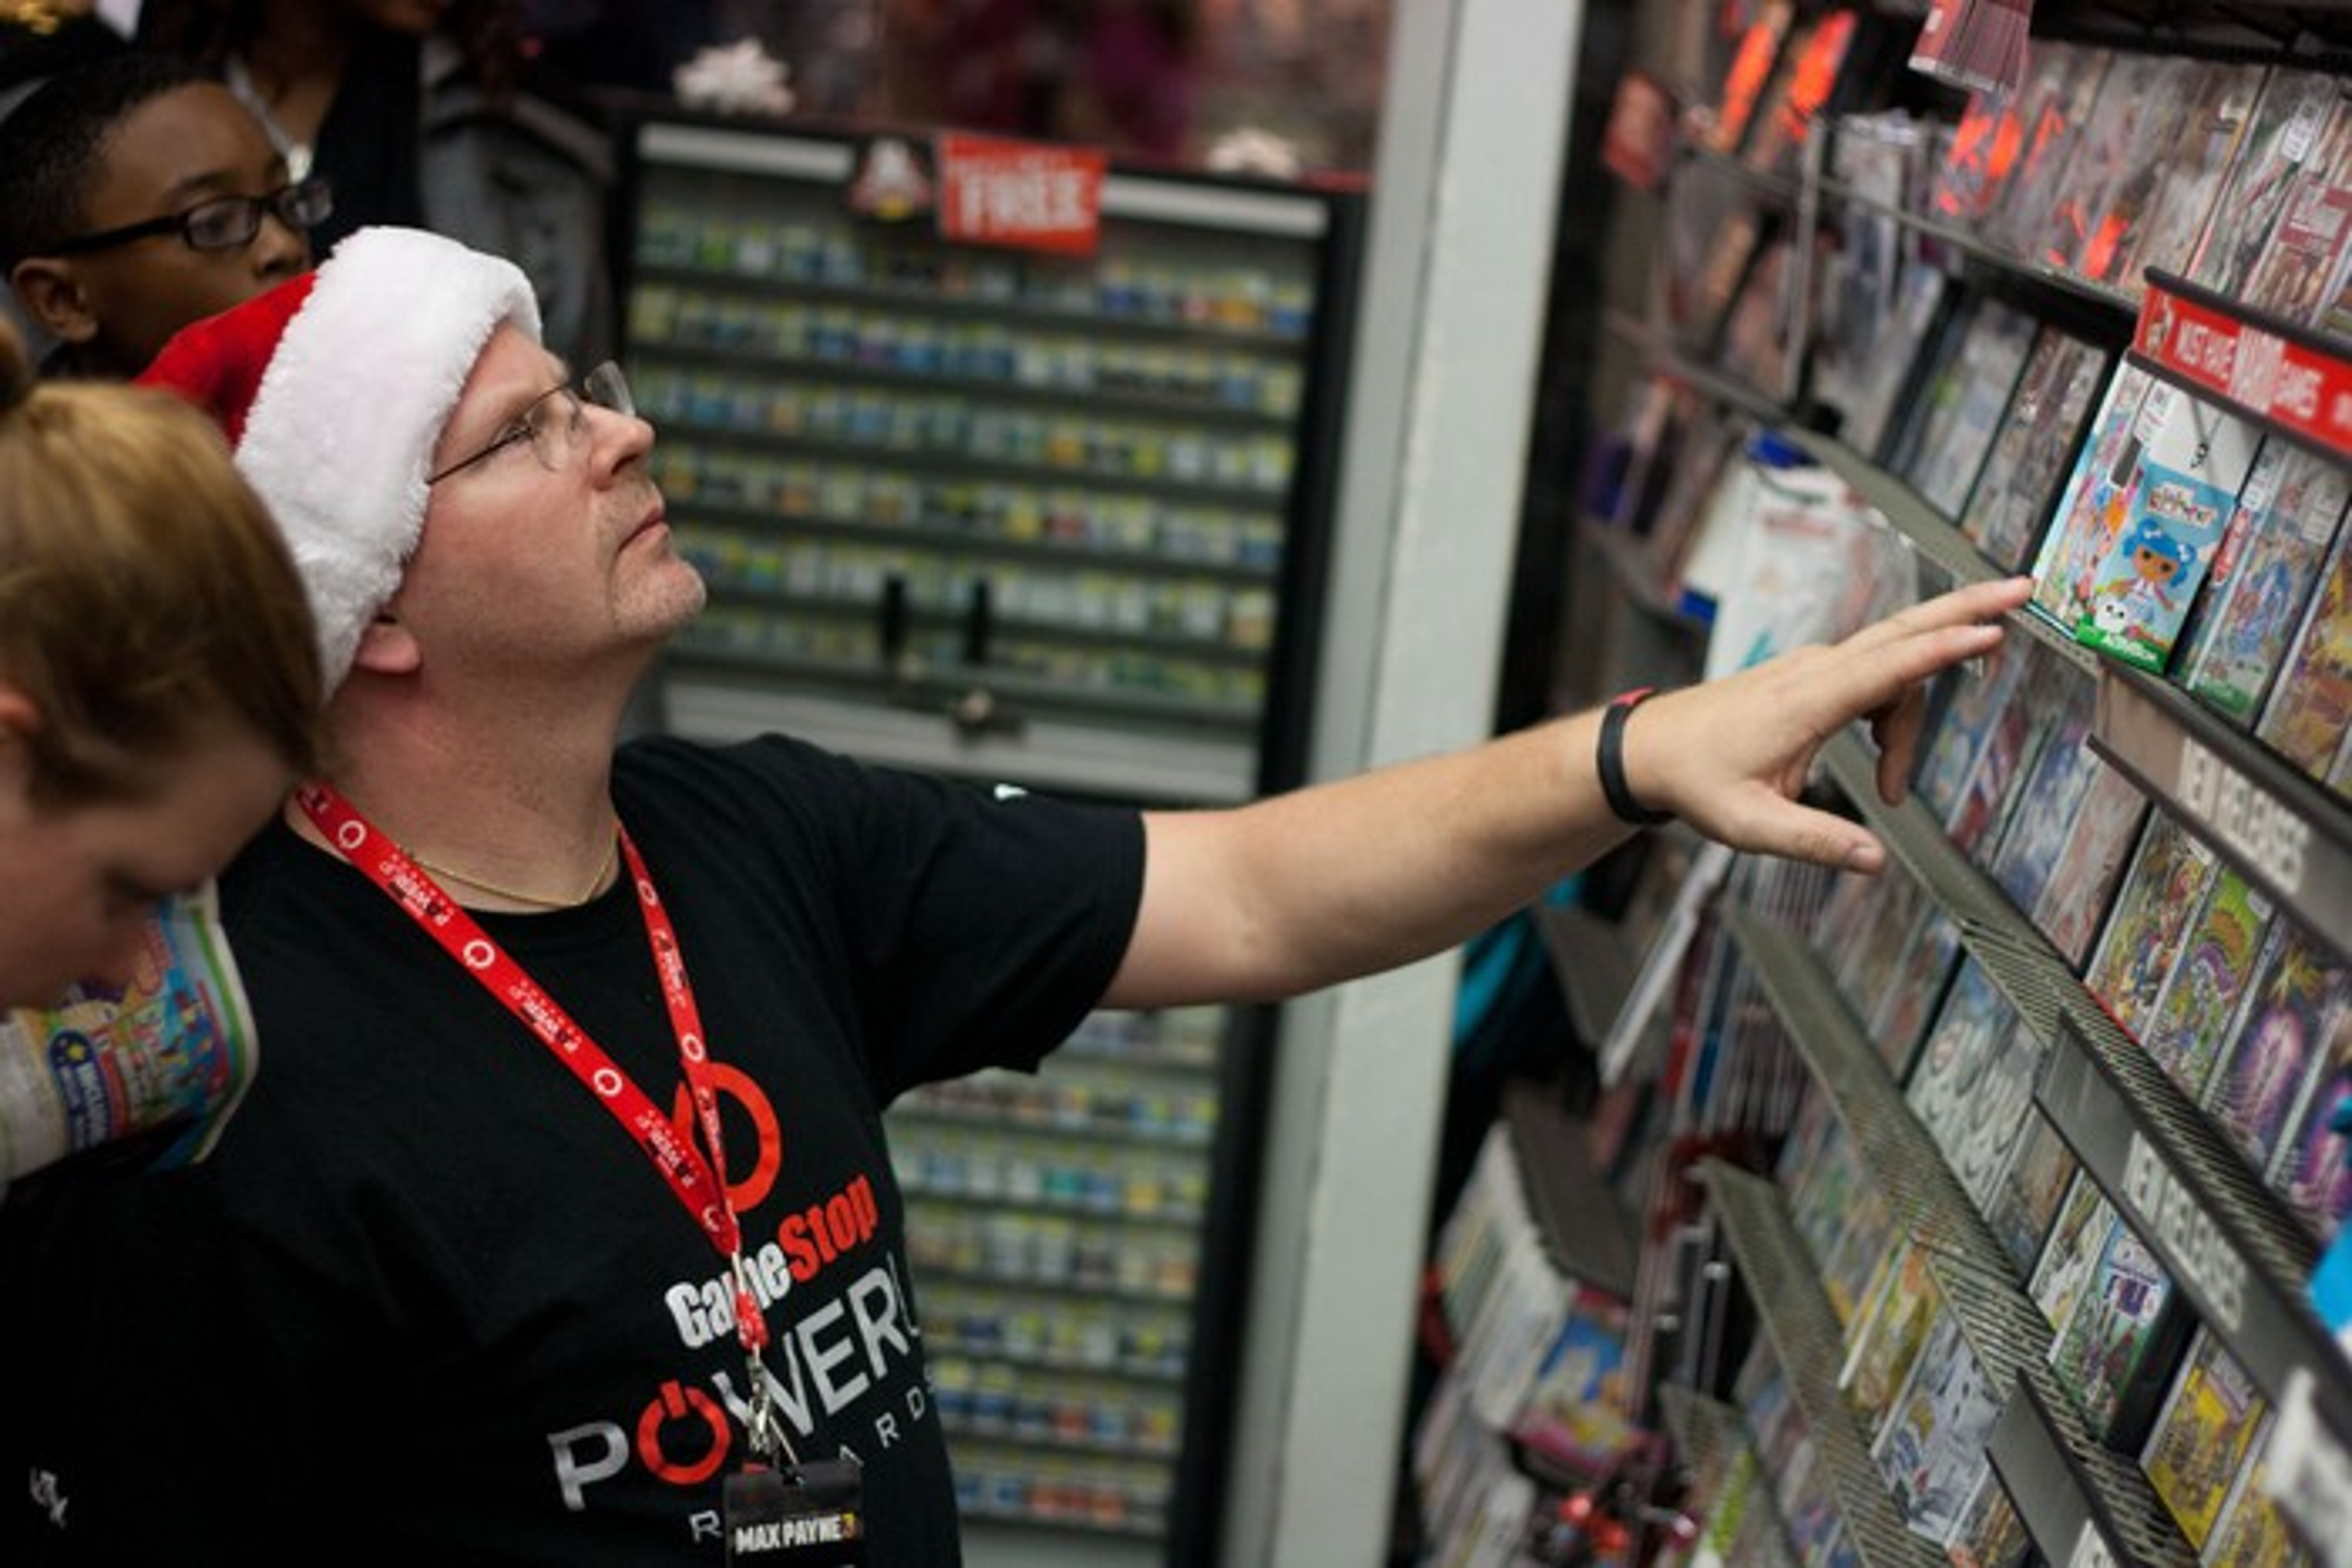 GameStop employee wearing a Santa hat and helping customers